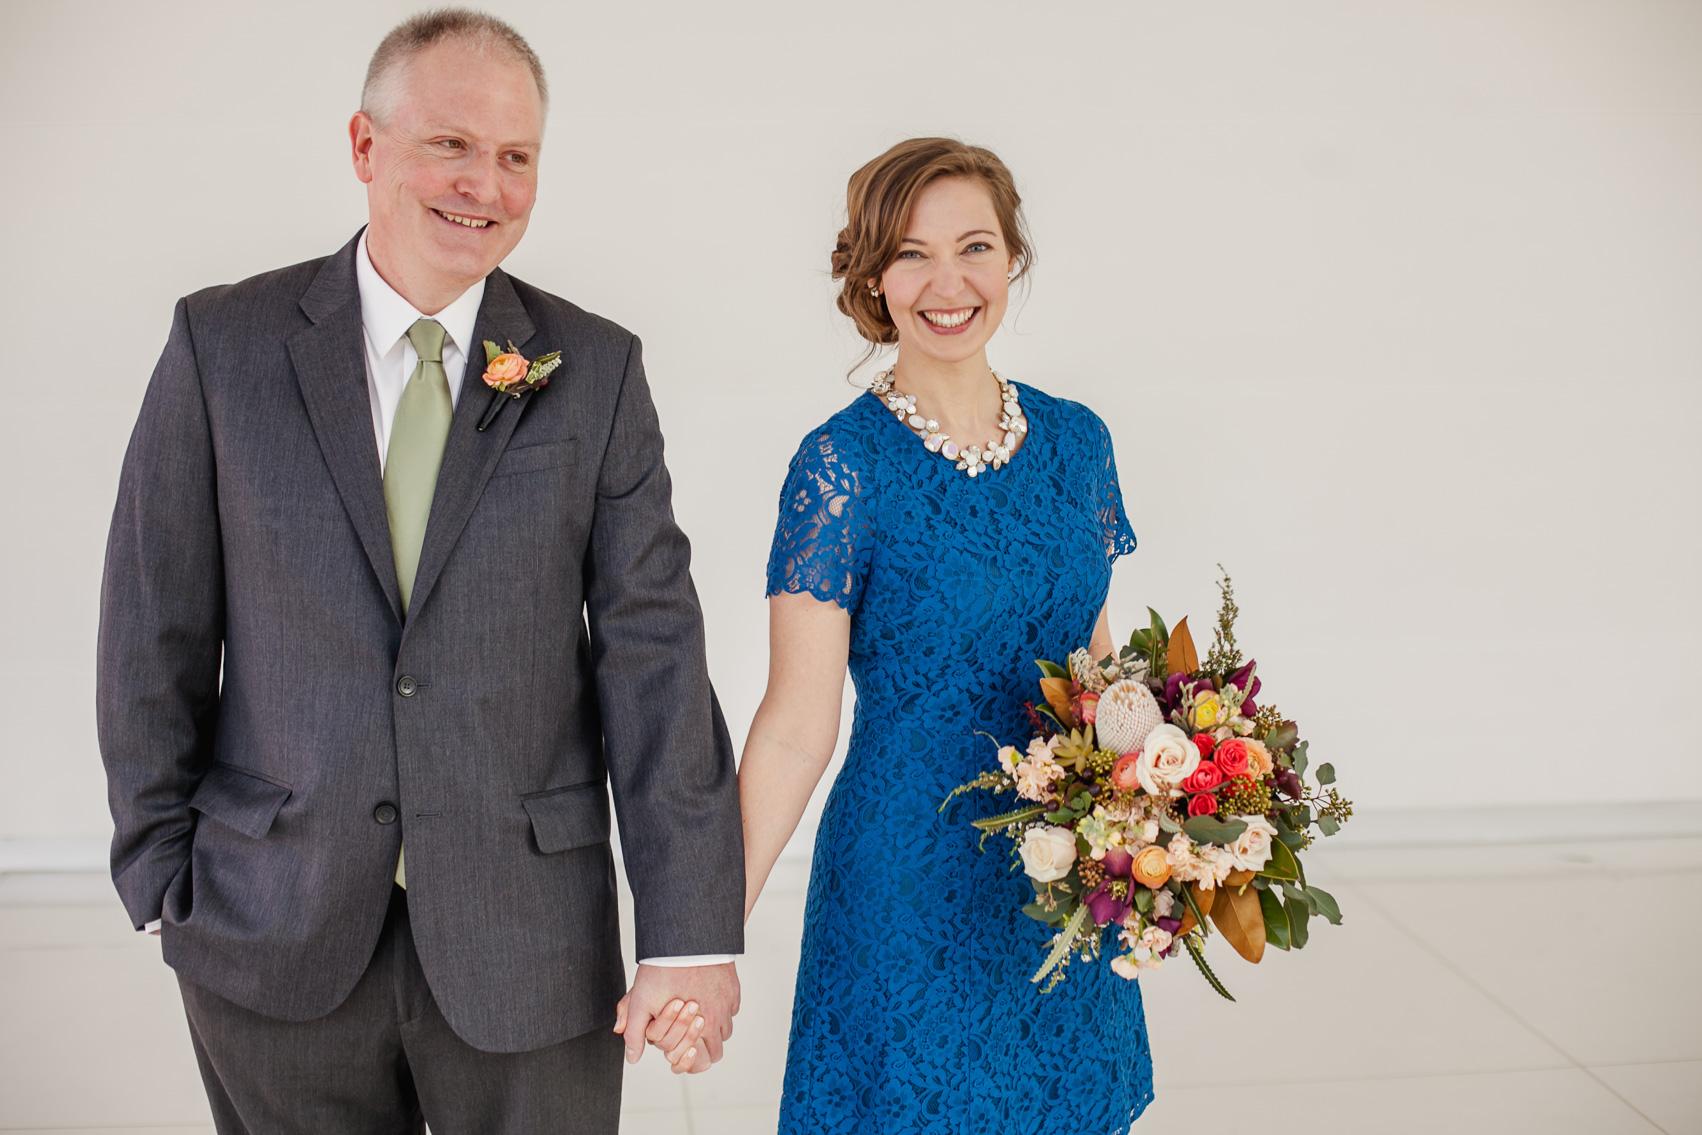 madison-wedding-photographer-2.jpg